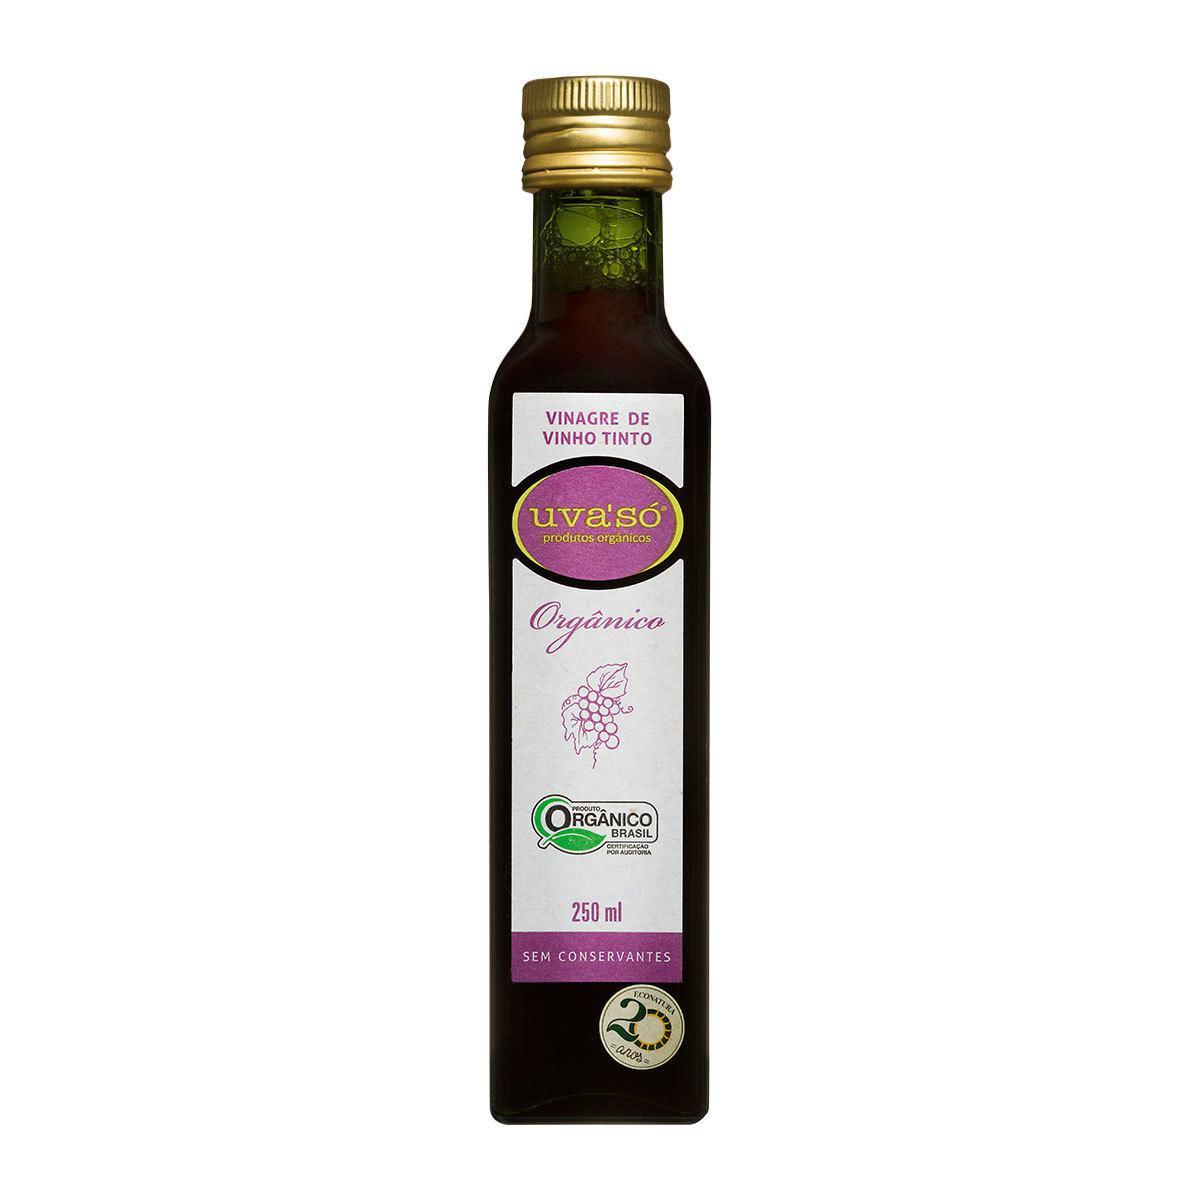 Vinagre de Vinho Tinto Orgânico  Uva'Só 250ml